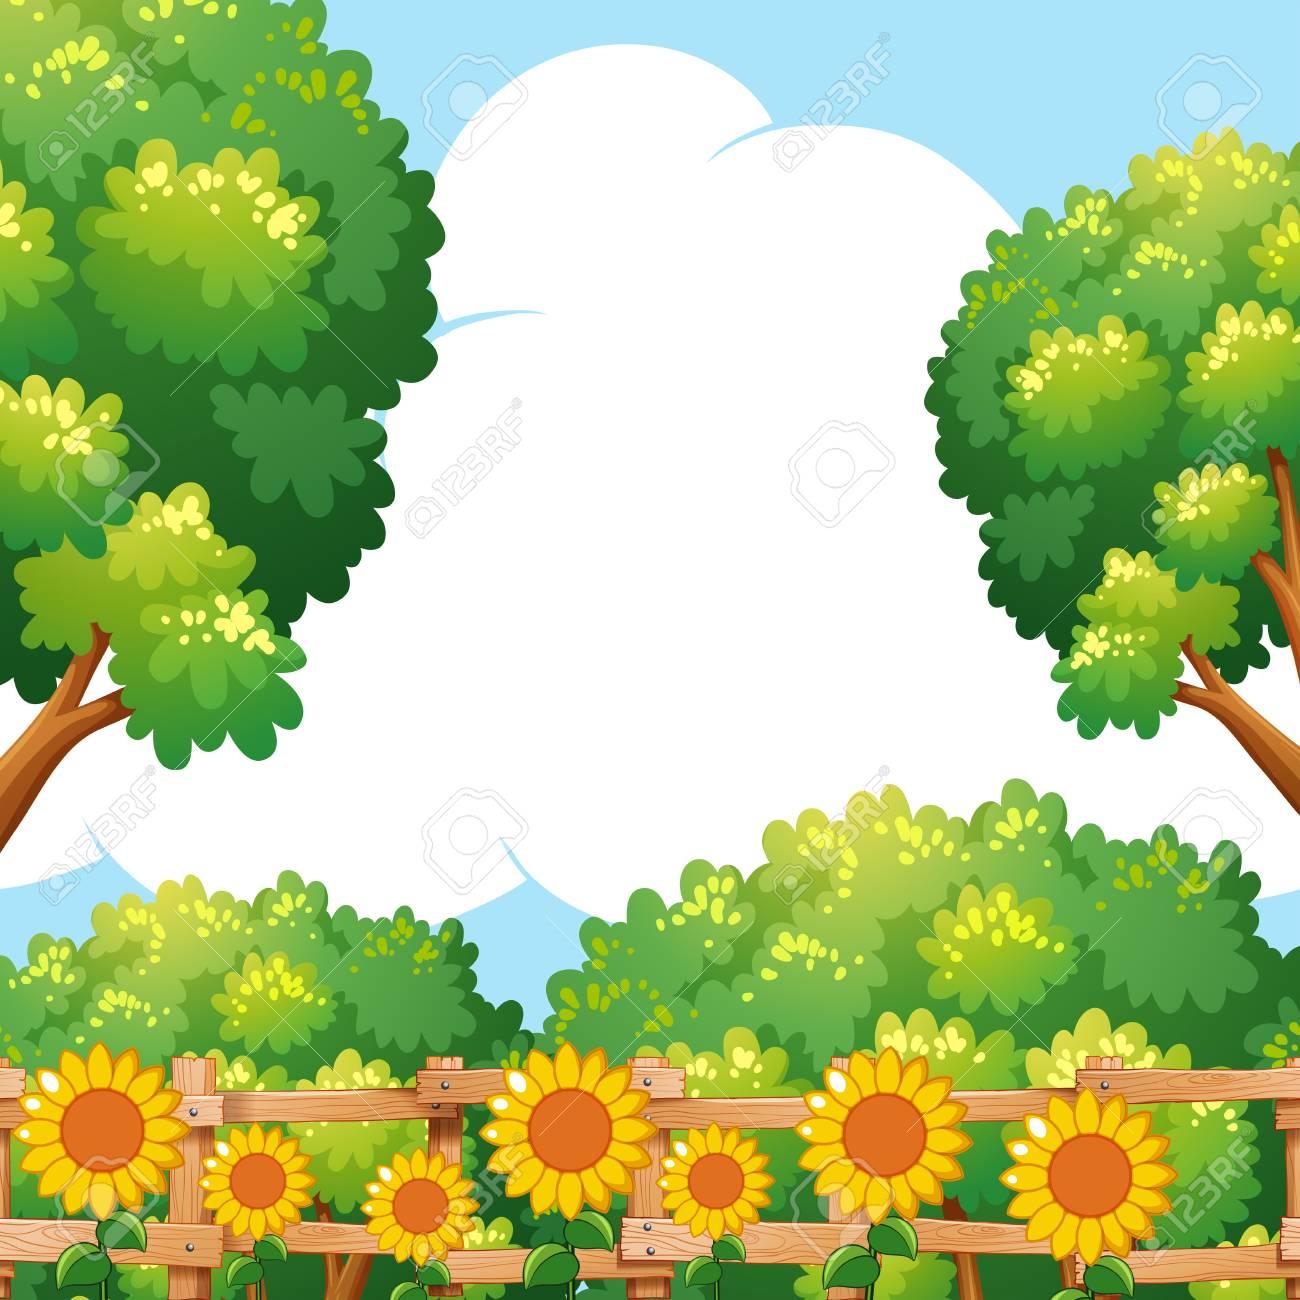 Background scene with sunflowers in garden illustration.